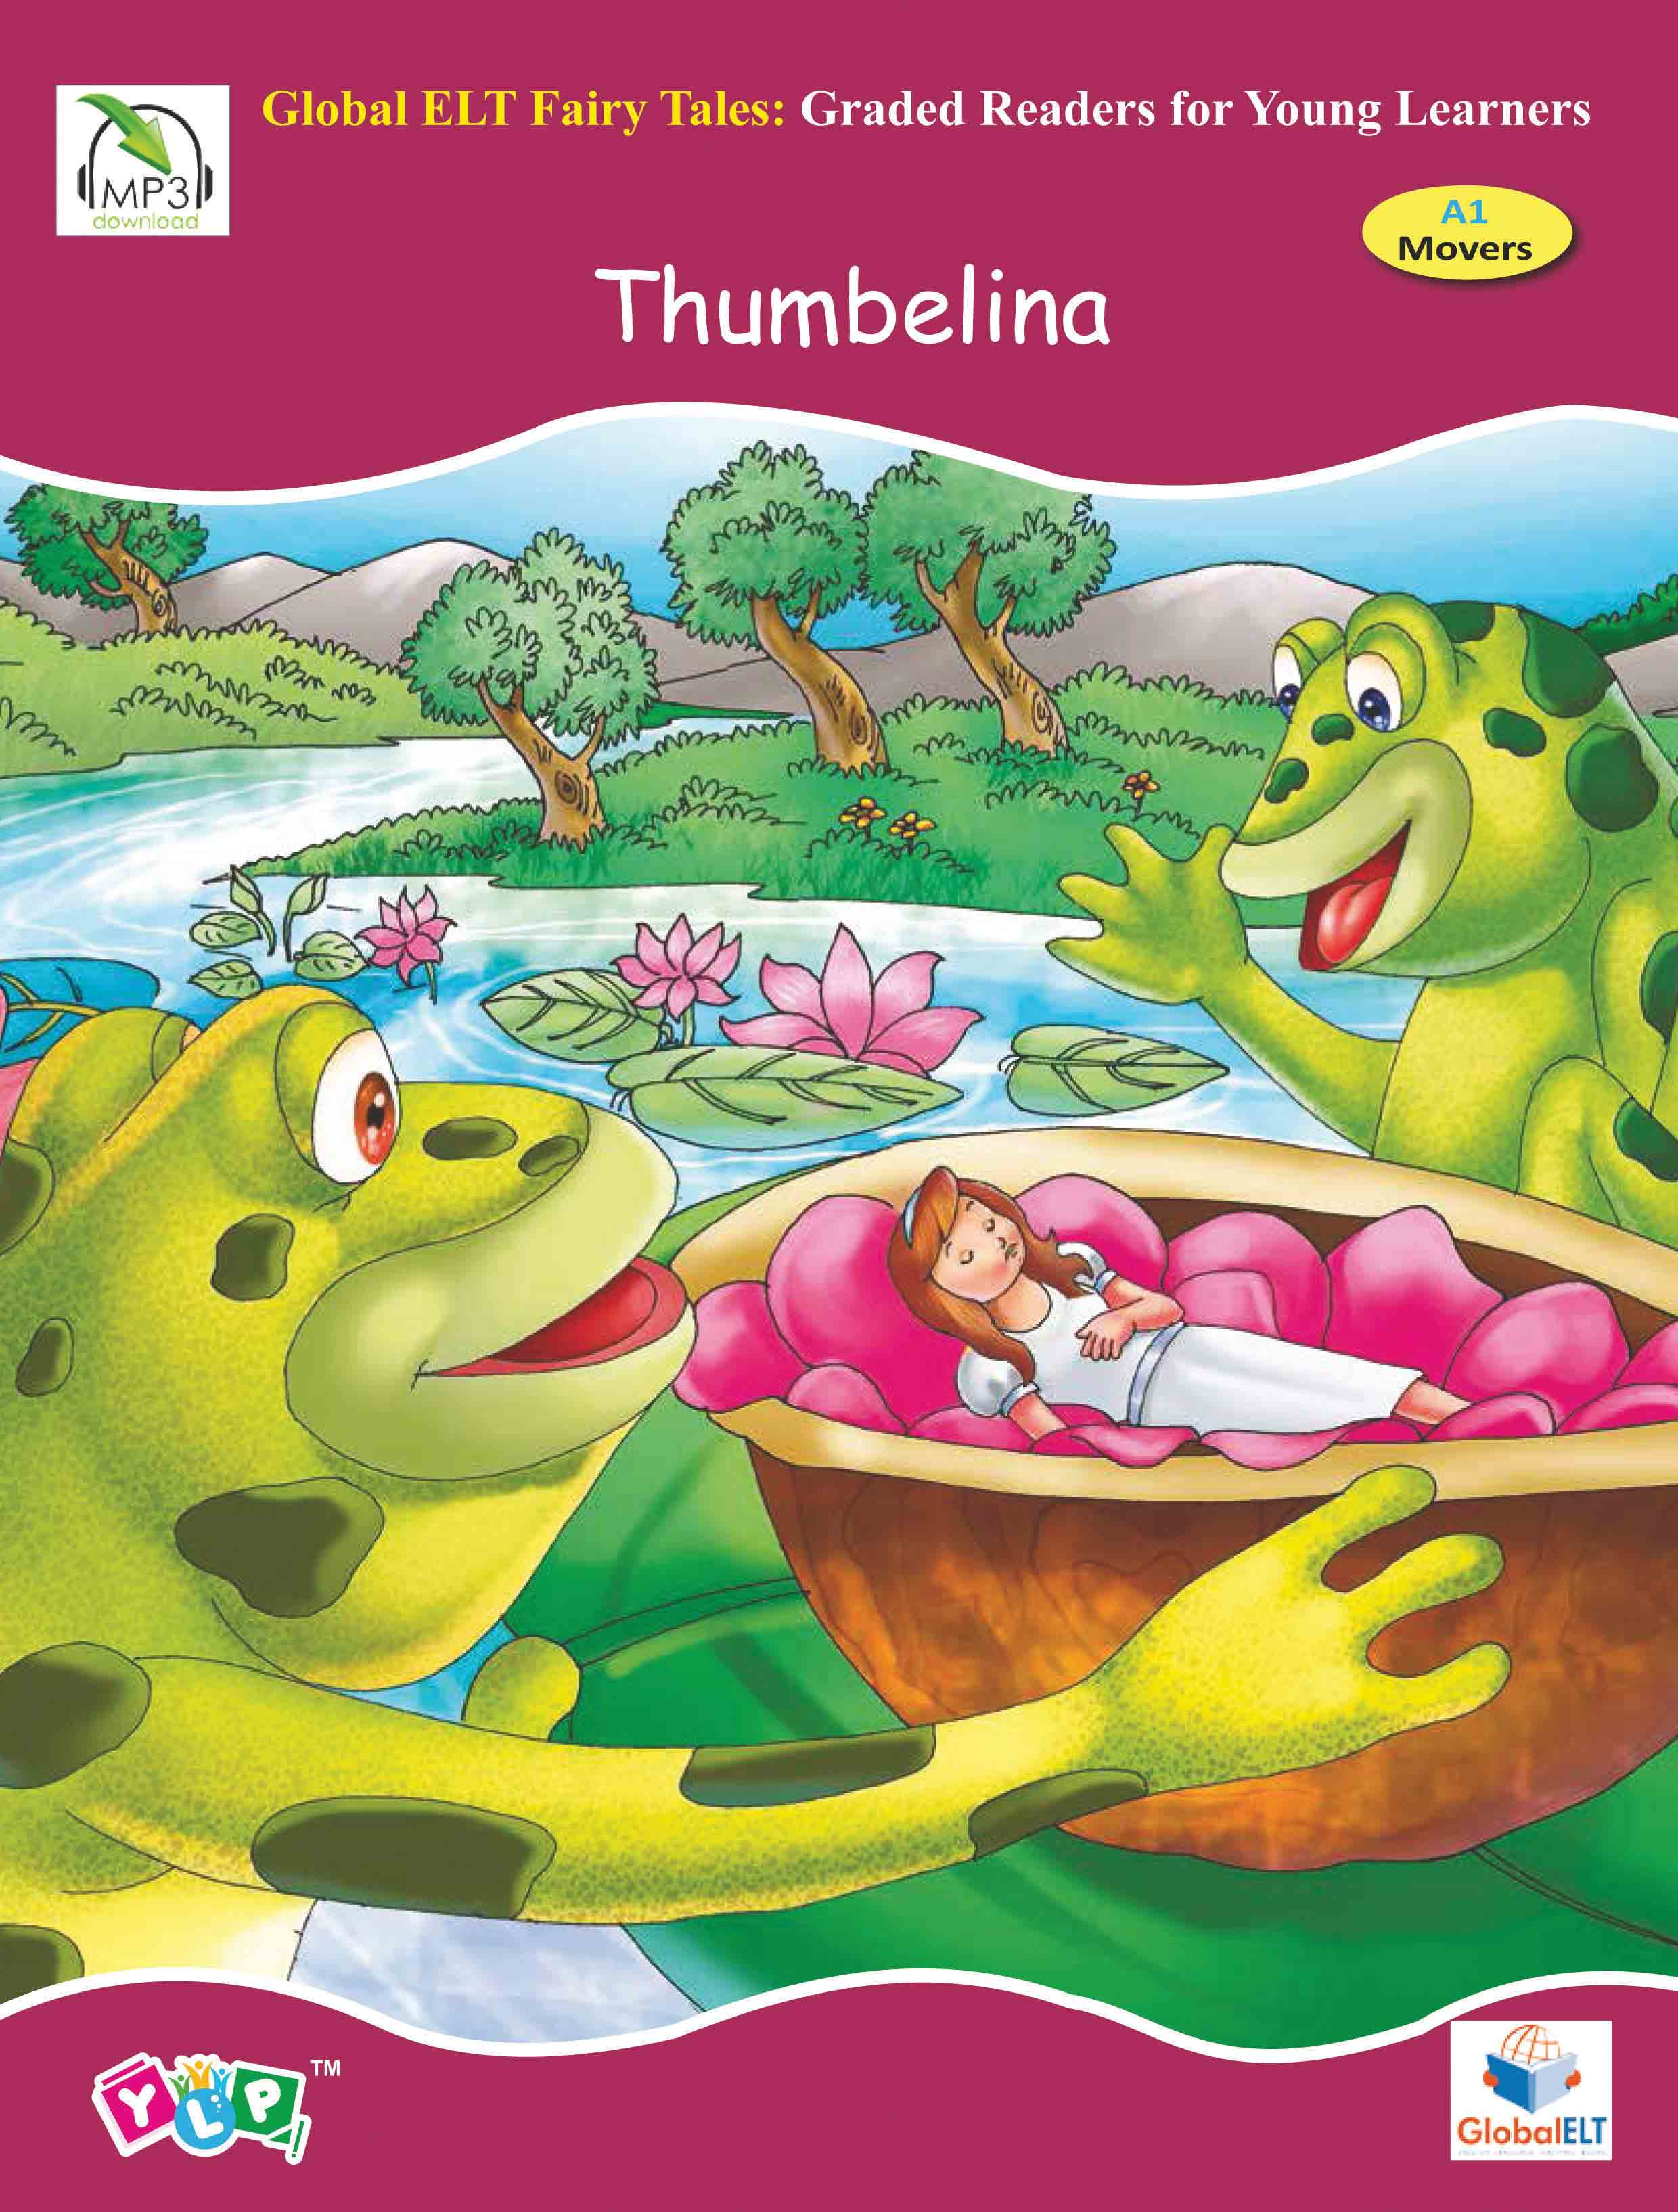 Fairy Tales Graded Reader - Thumbelina - Level A1 Movers